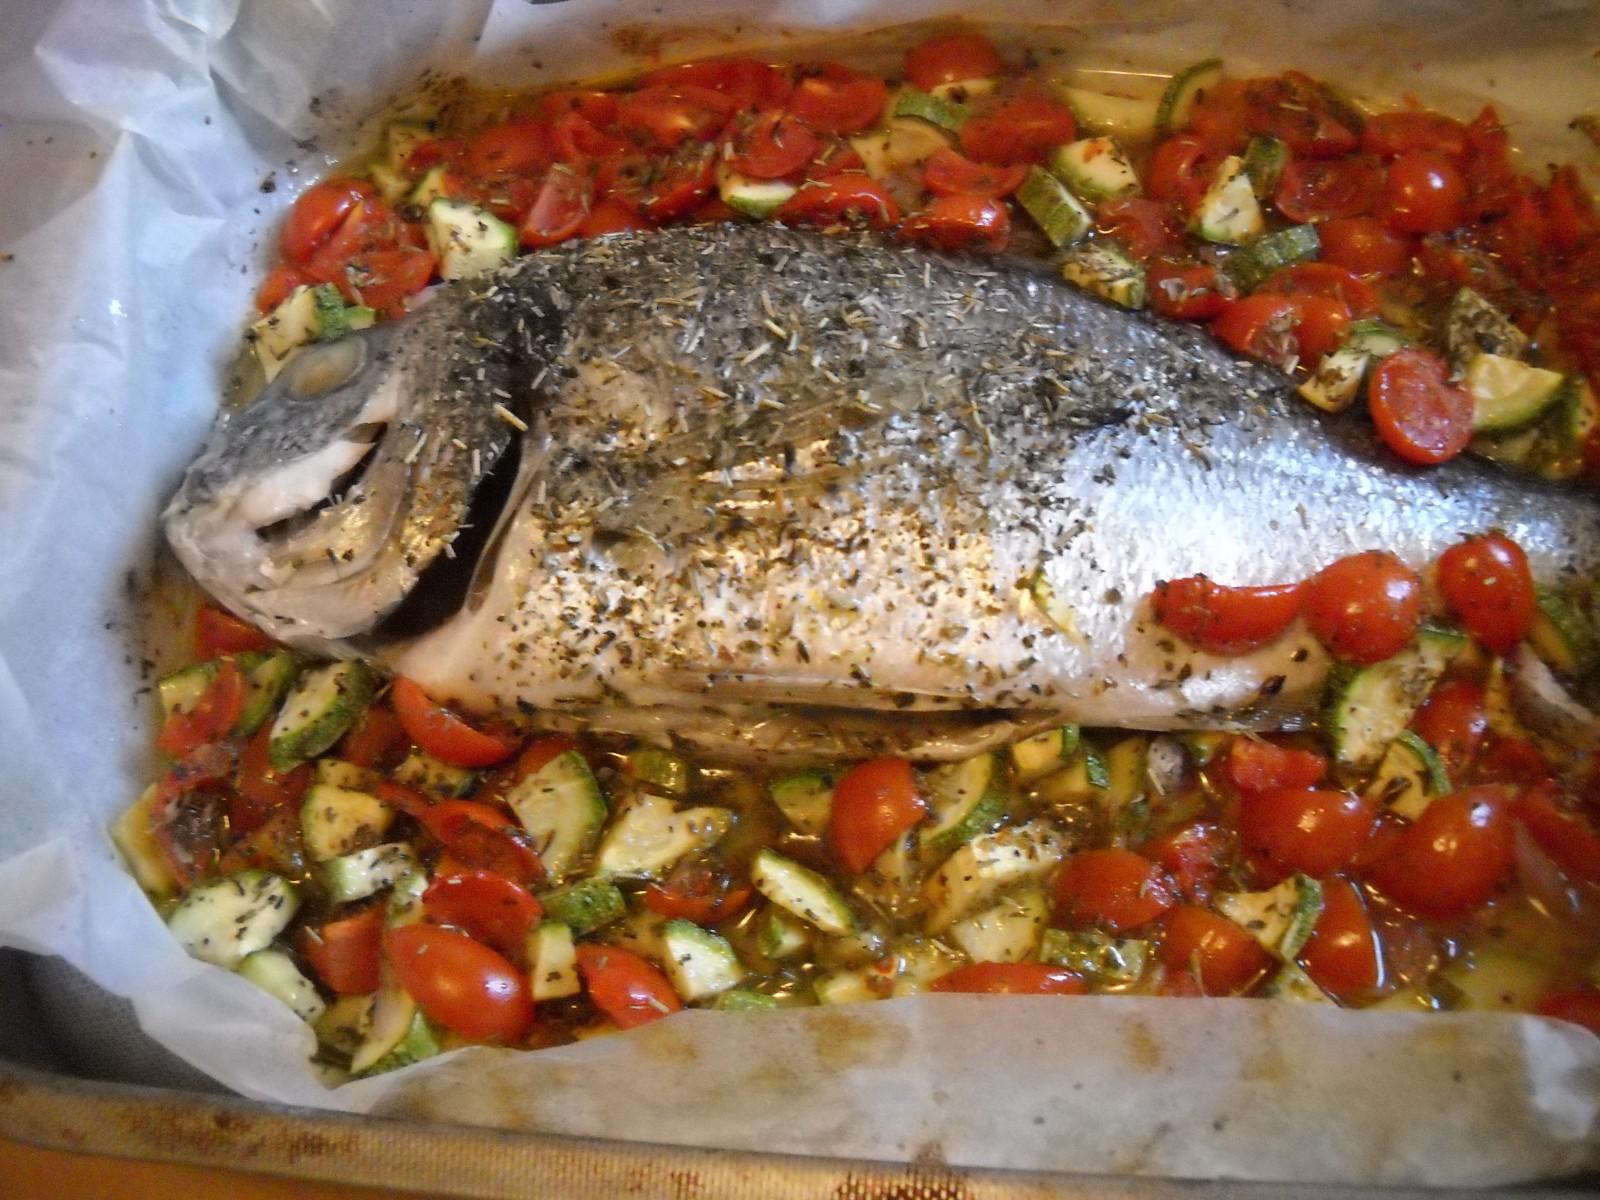 Receta de dorada al horno con verduras - Recetas de bogavante al horno ...